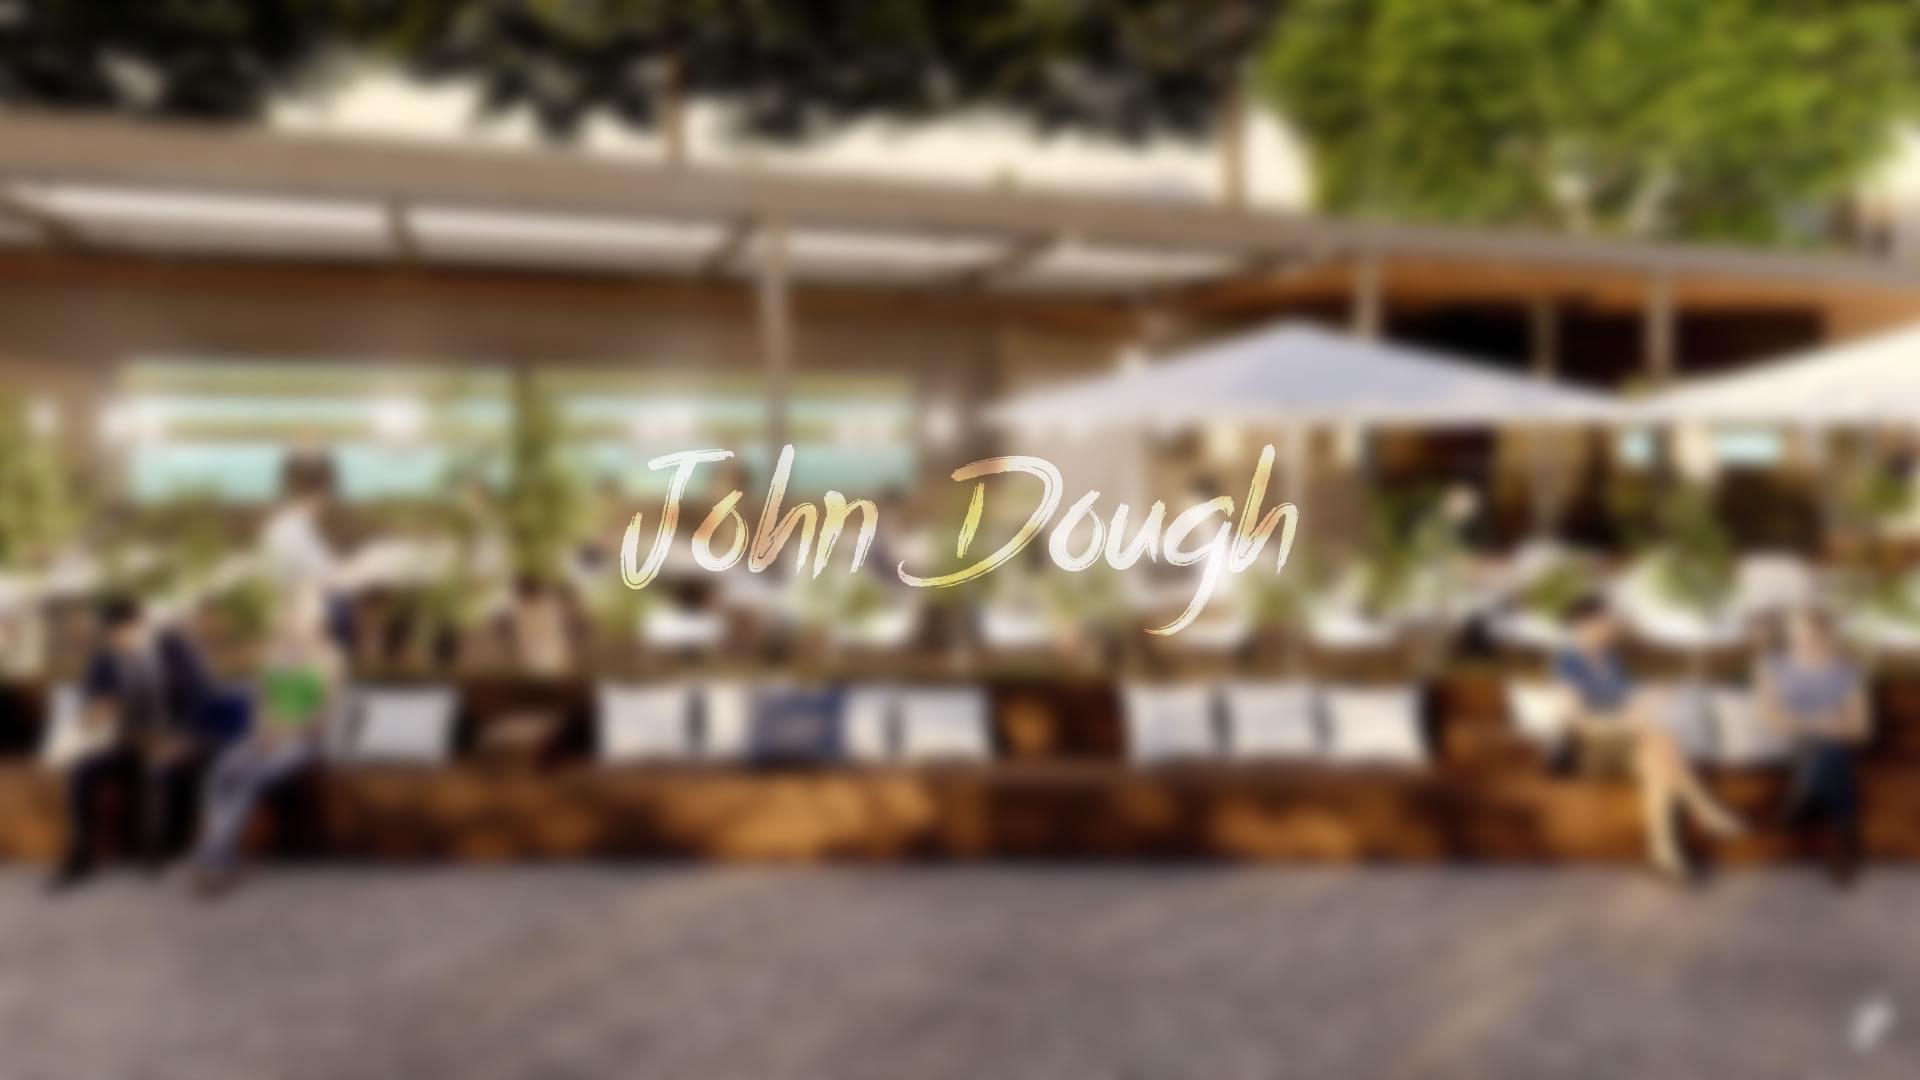 john_dough_whocares_design (1).jpg